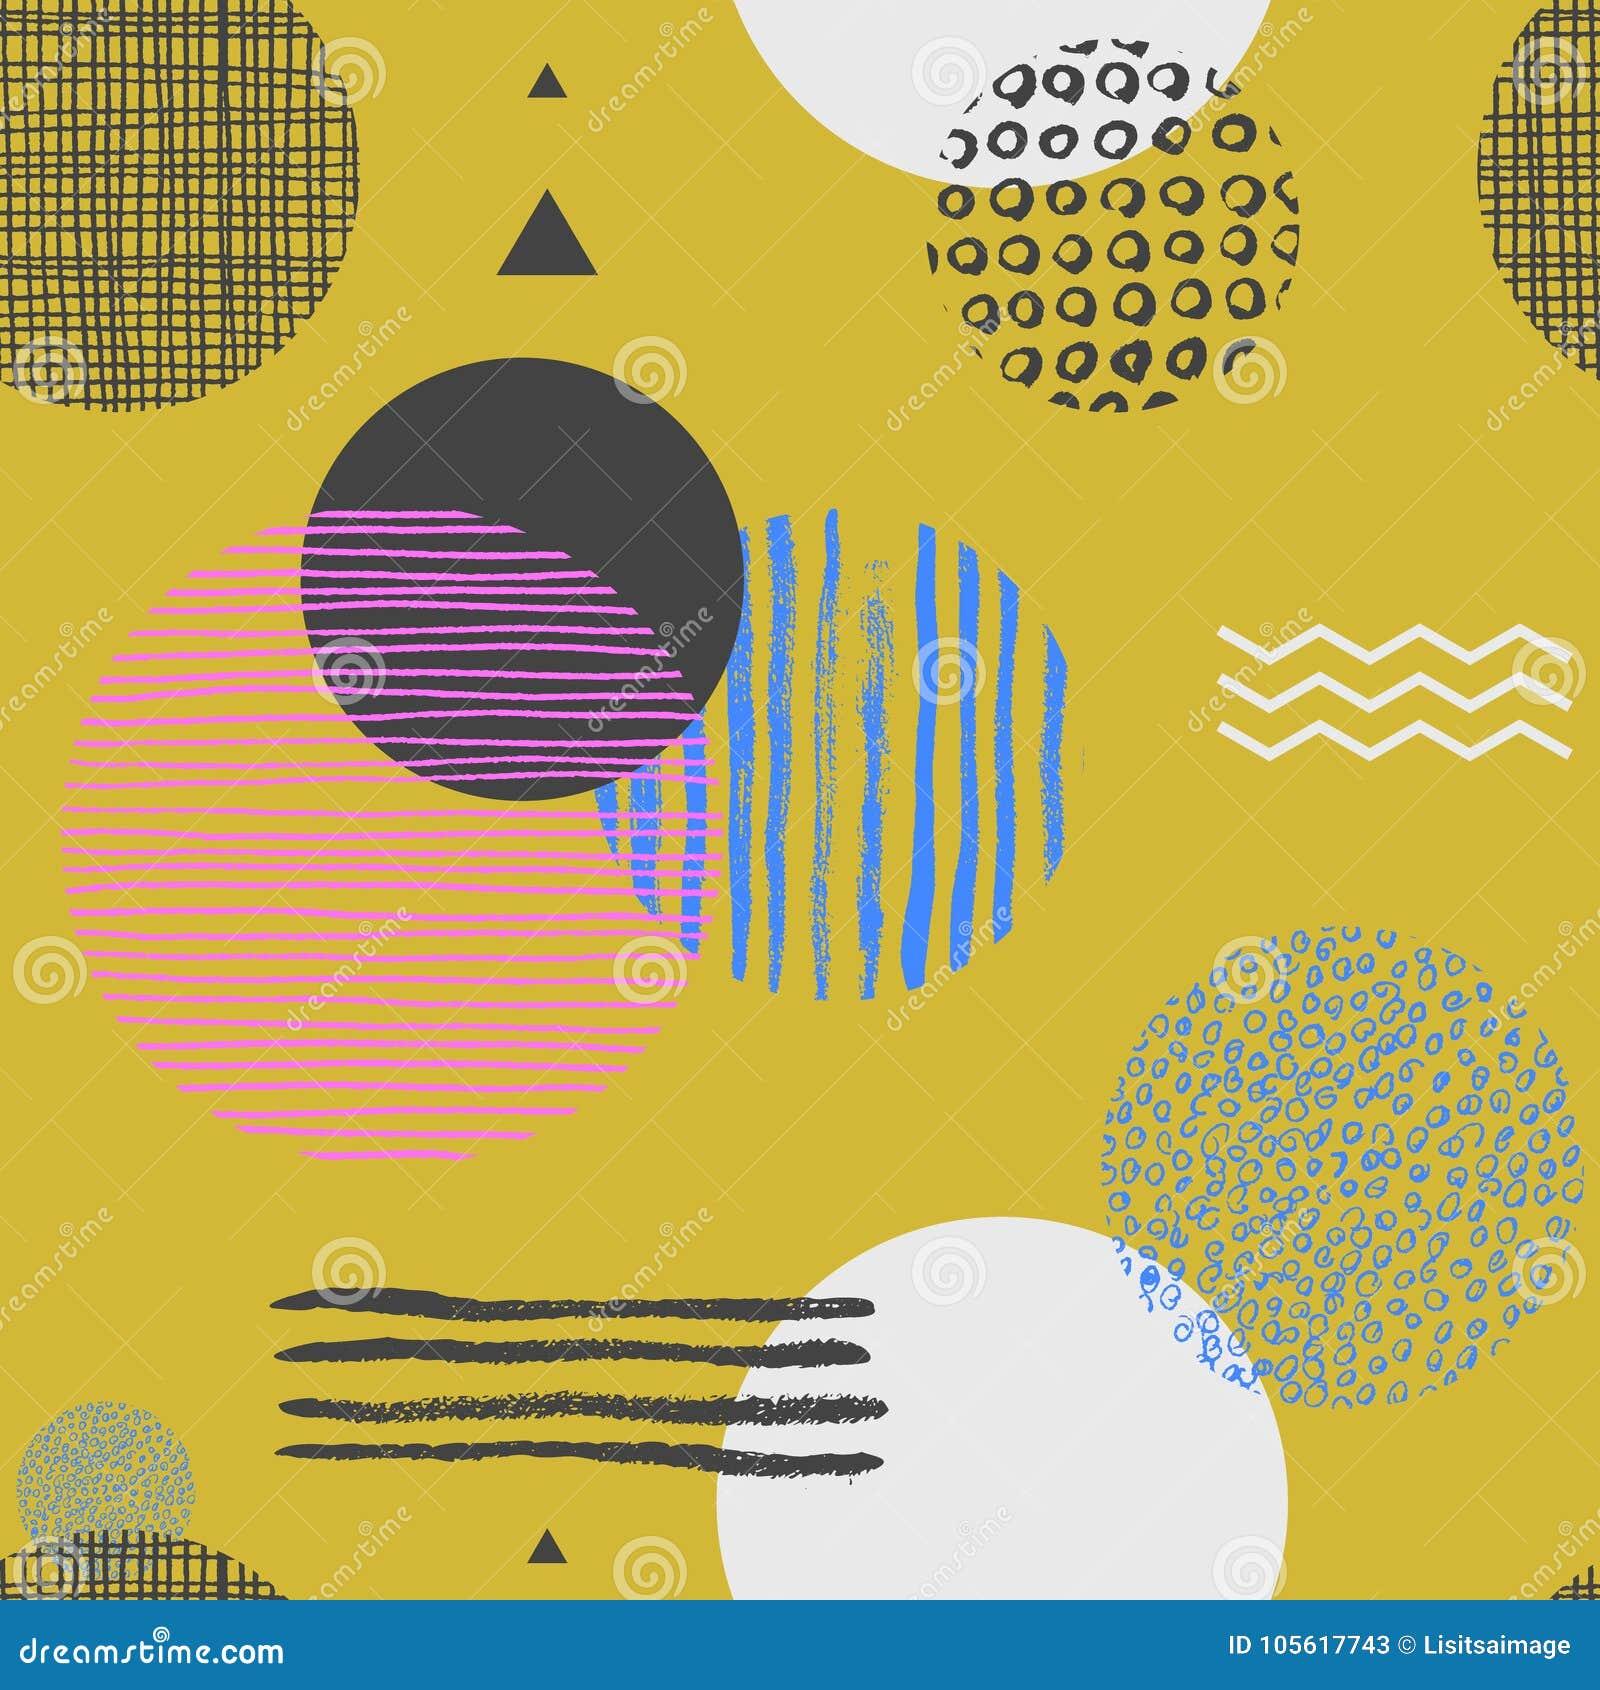 geometric yellow background illustration - photo #40